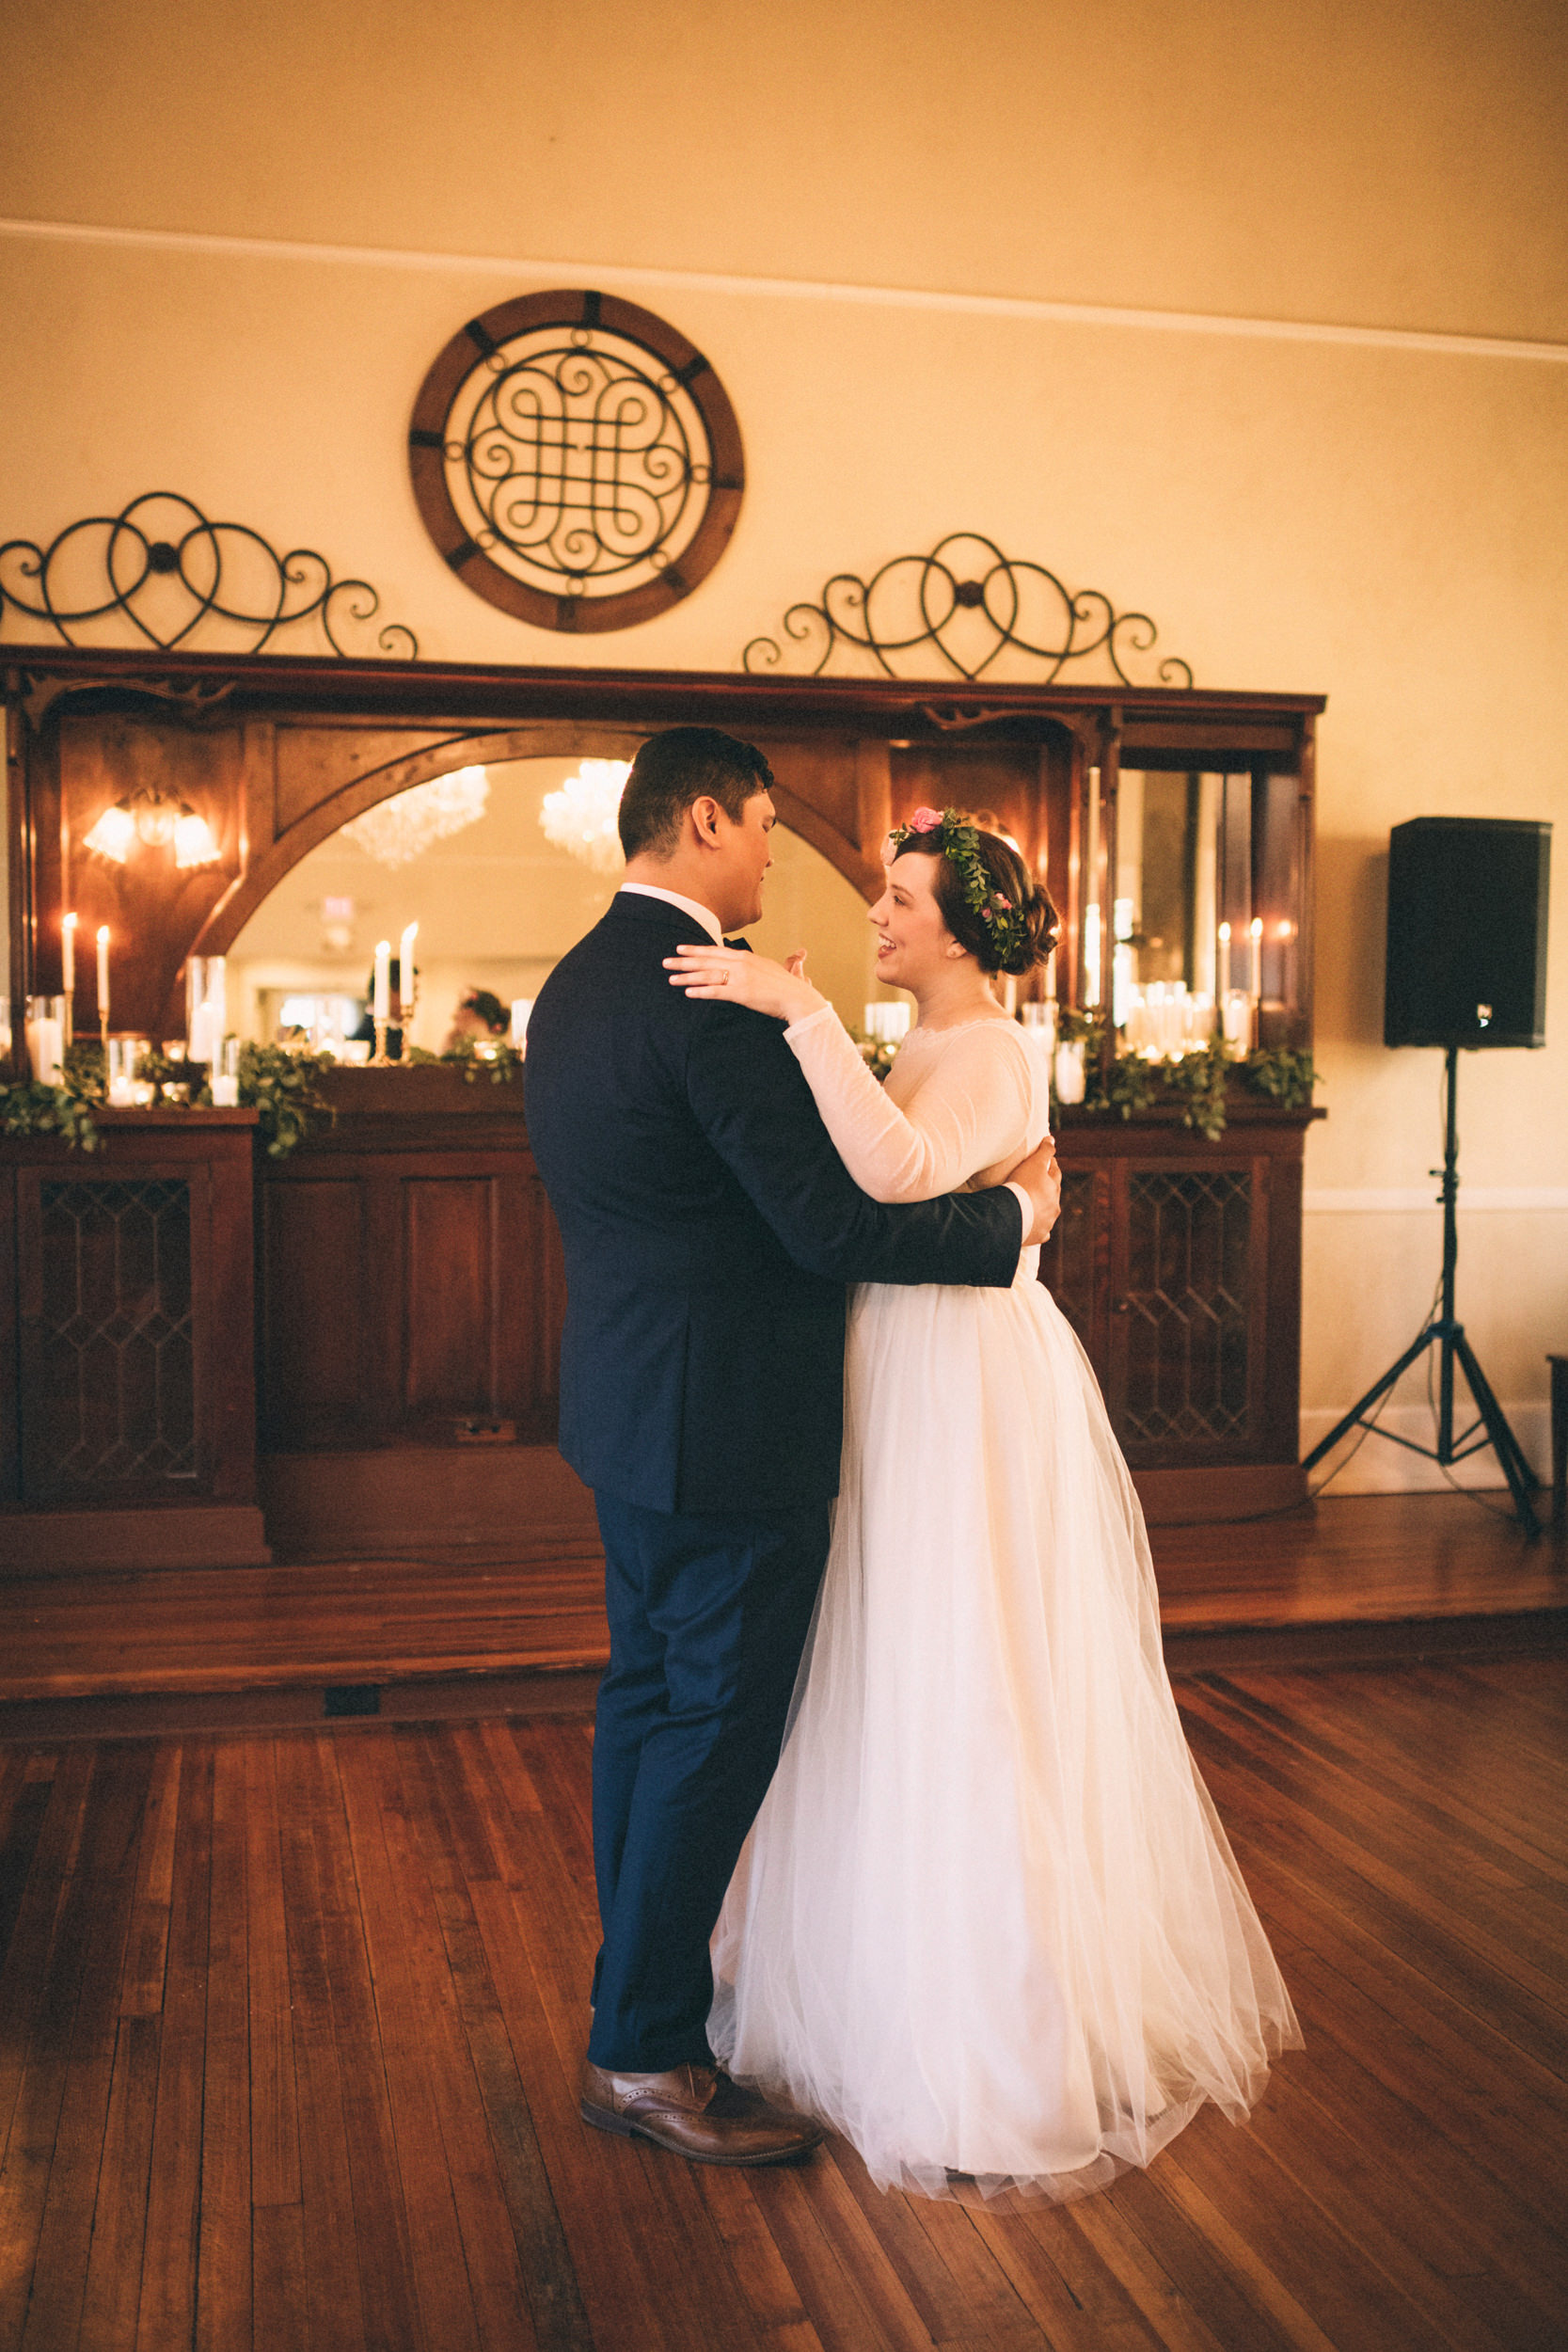 lauren-dean-wedding-grand-lodge-kentucky-sarah-katherine-davis-photography-558edit.jpg